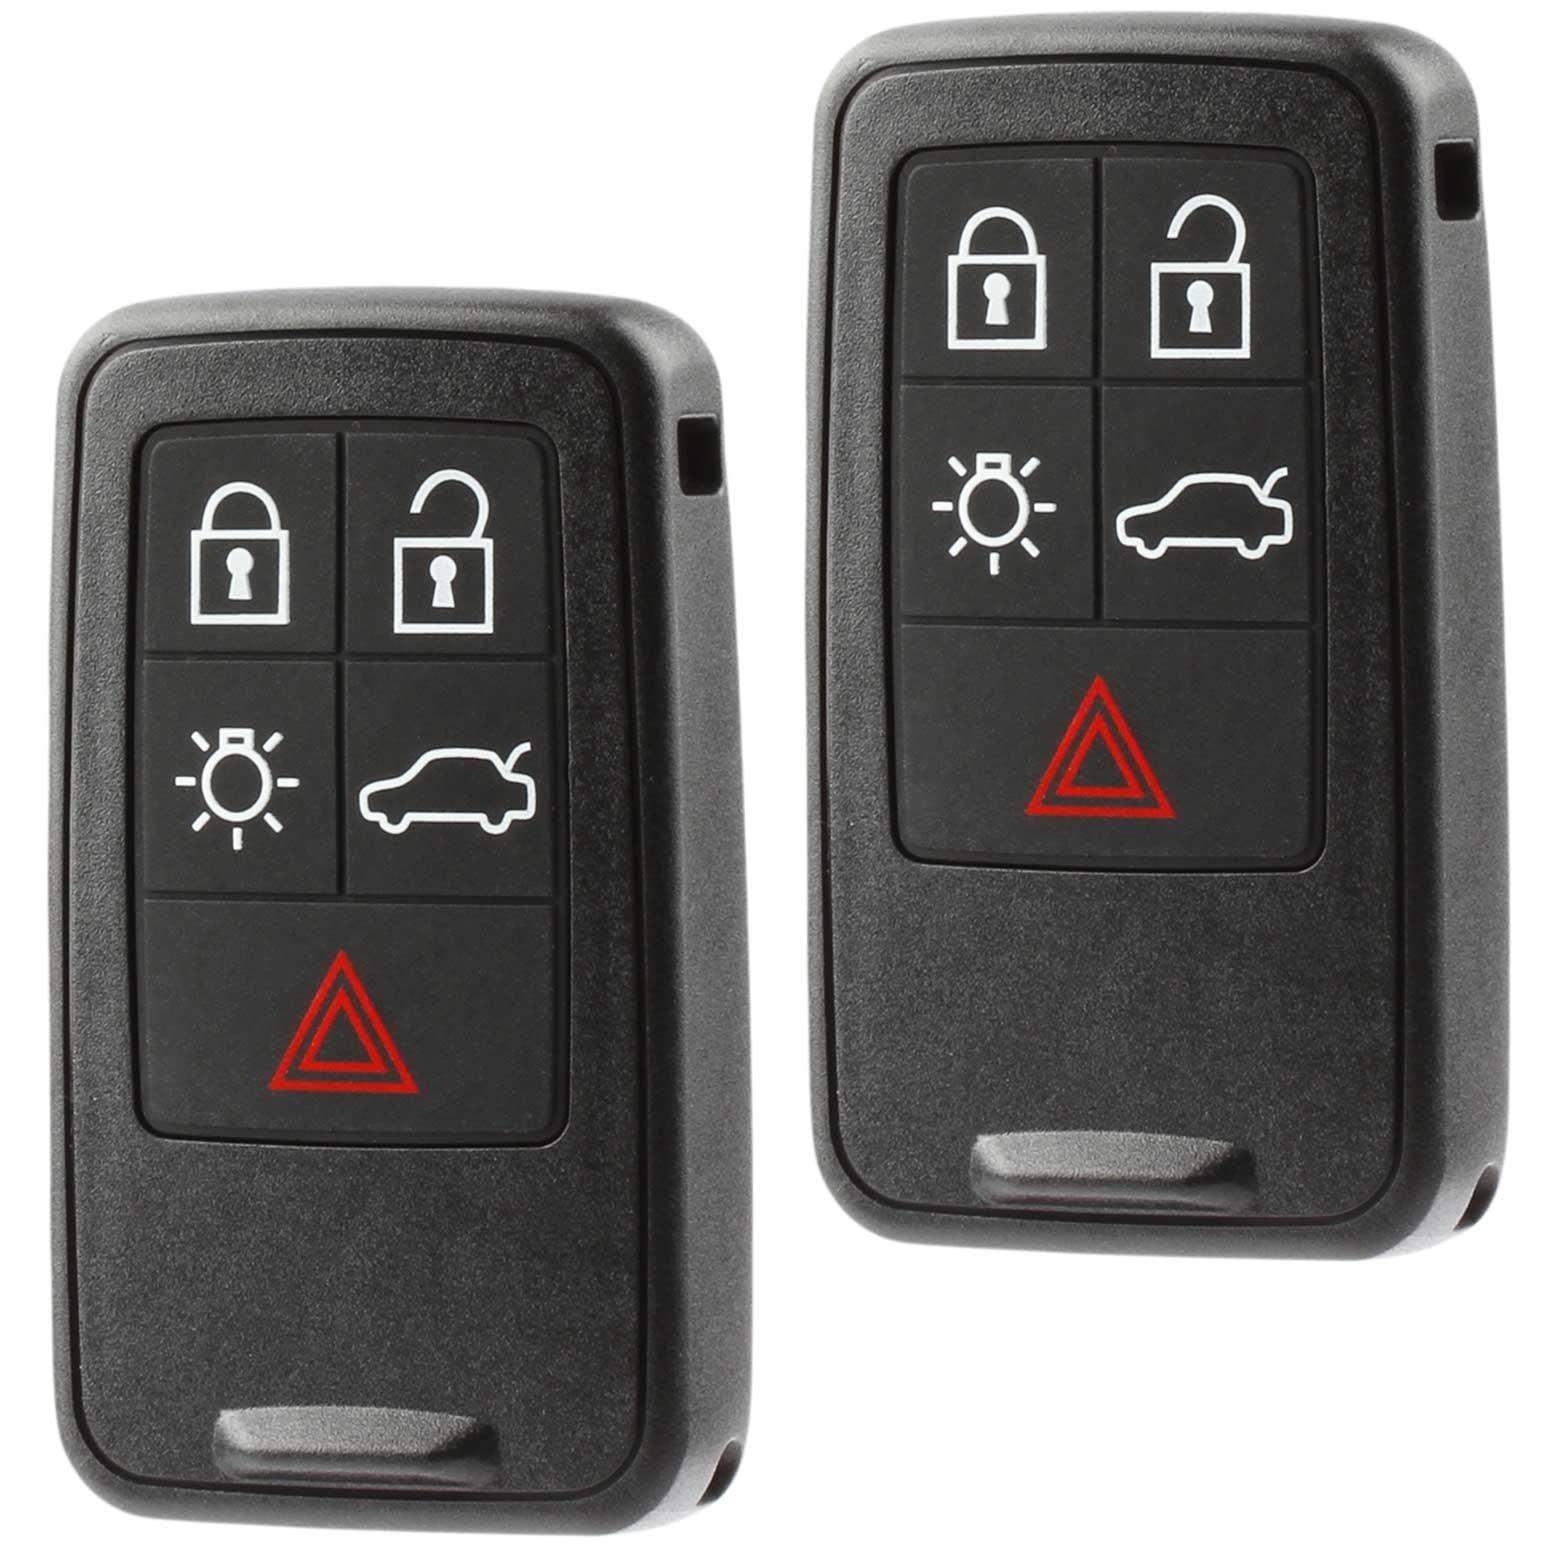 Car Key Fob Keyless Entry Smart Remote fits Volvo S60 S80 V60 V70 XC60 XC70 (KR55WK49264), Set of 2 by USARemote